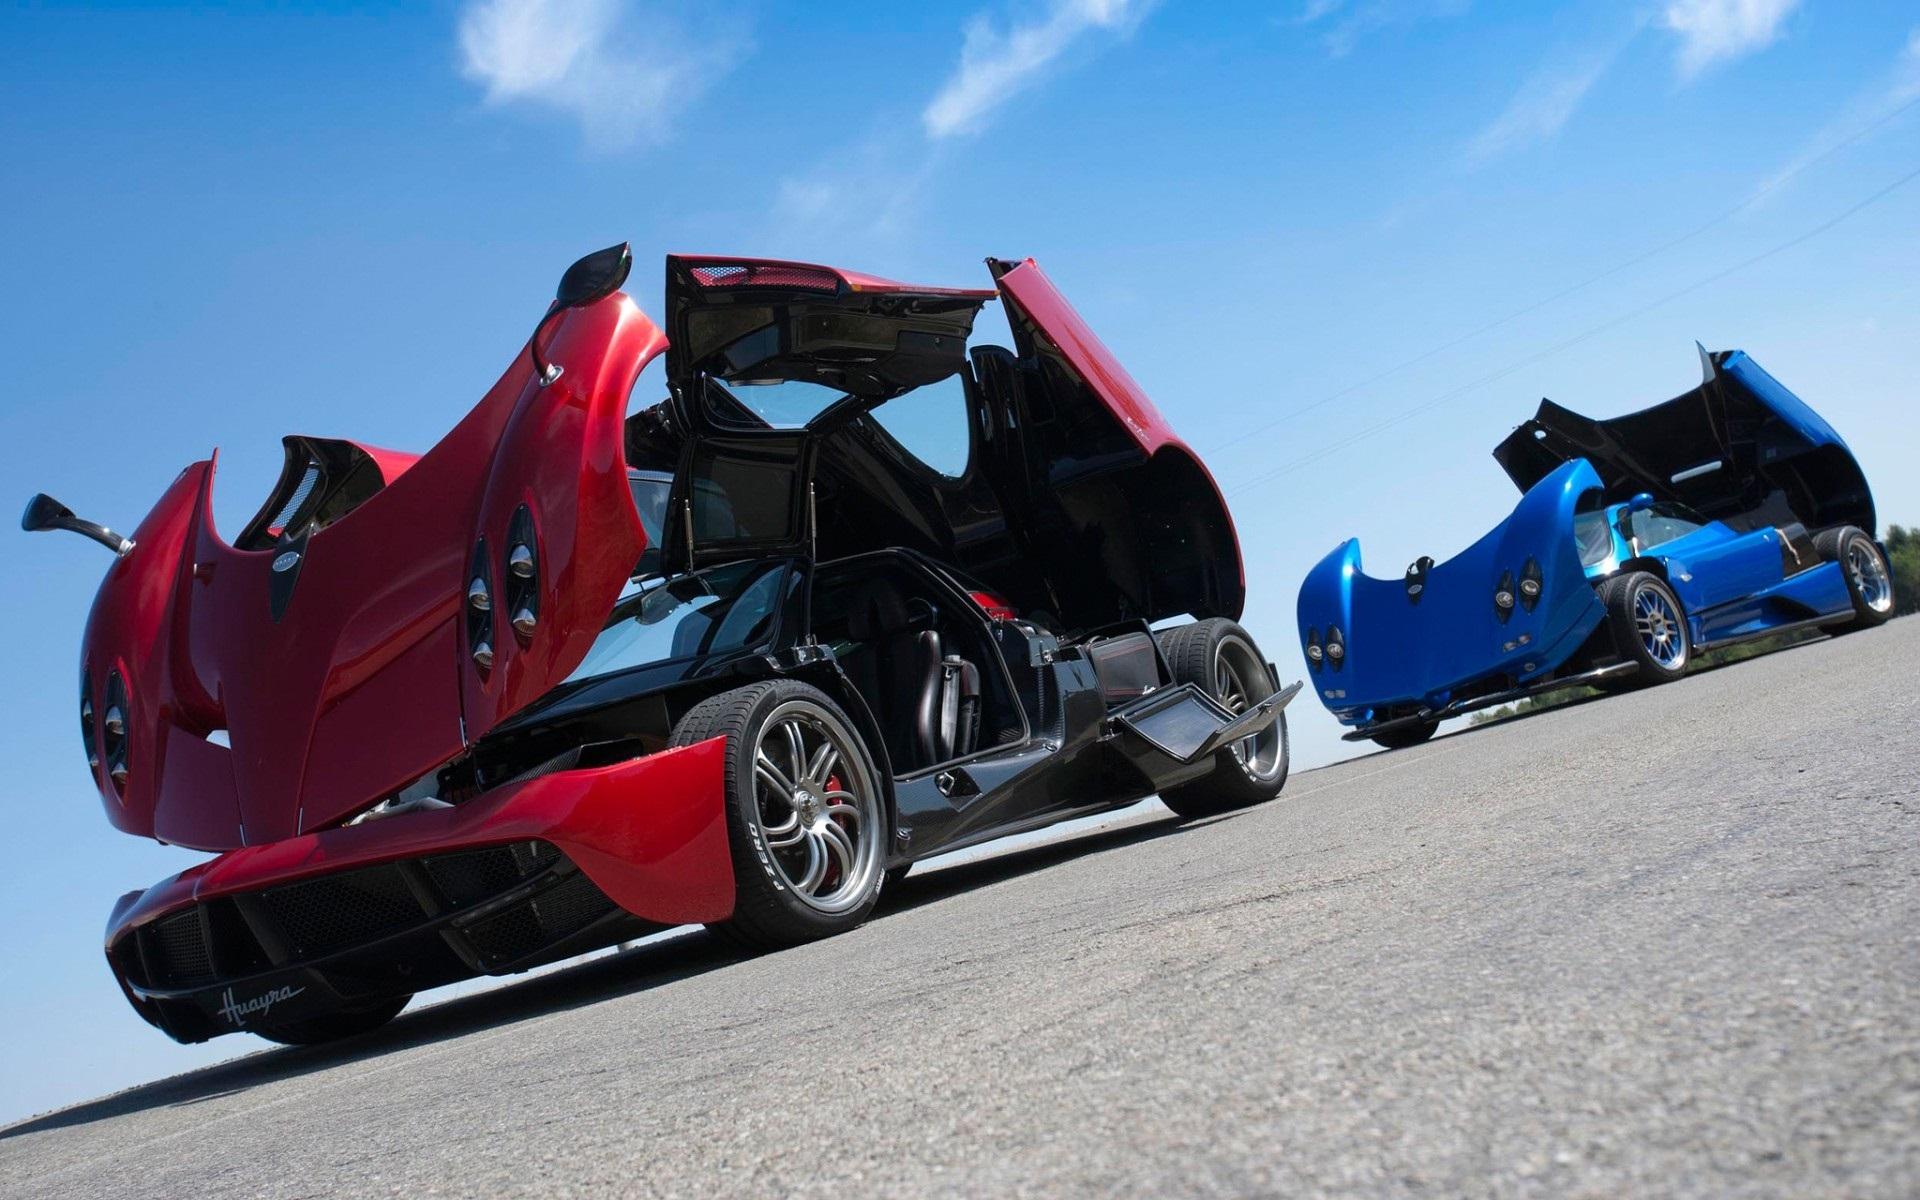 pagani rot und blau supercars 1920x1200 hd hintergrundbilder hd bild. Black Bedroom Furniture Sets. Home Design Ideas